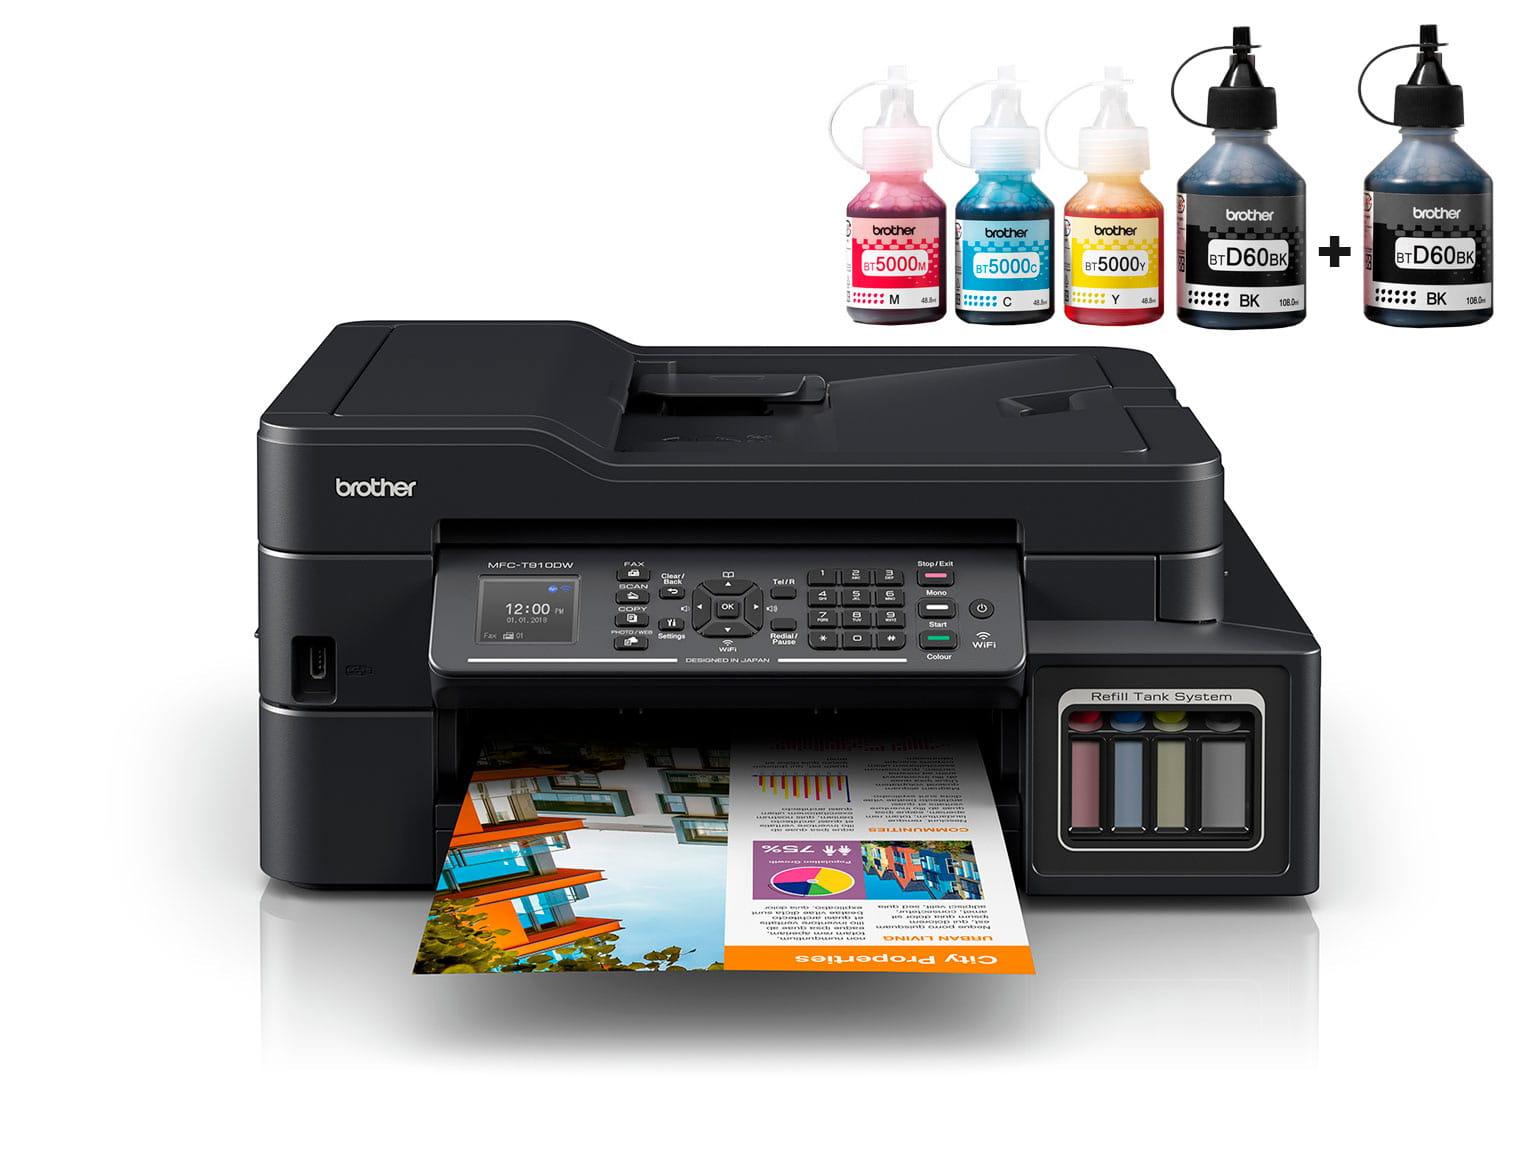 Brother InkBenefit Plus inkjet printer MFC-T910DW